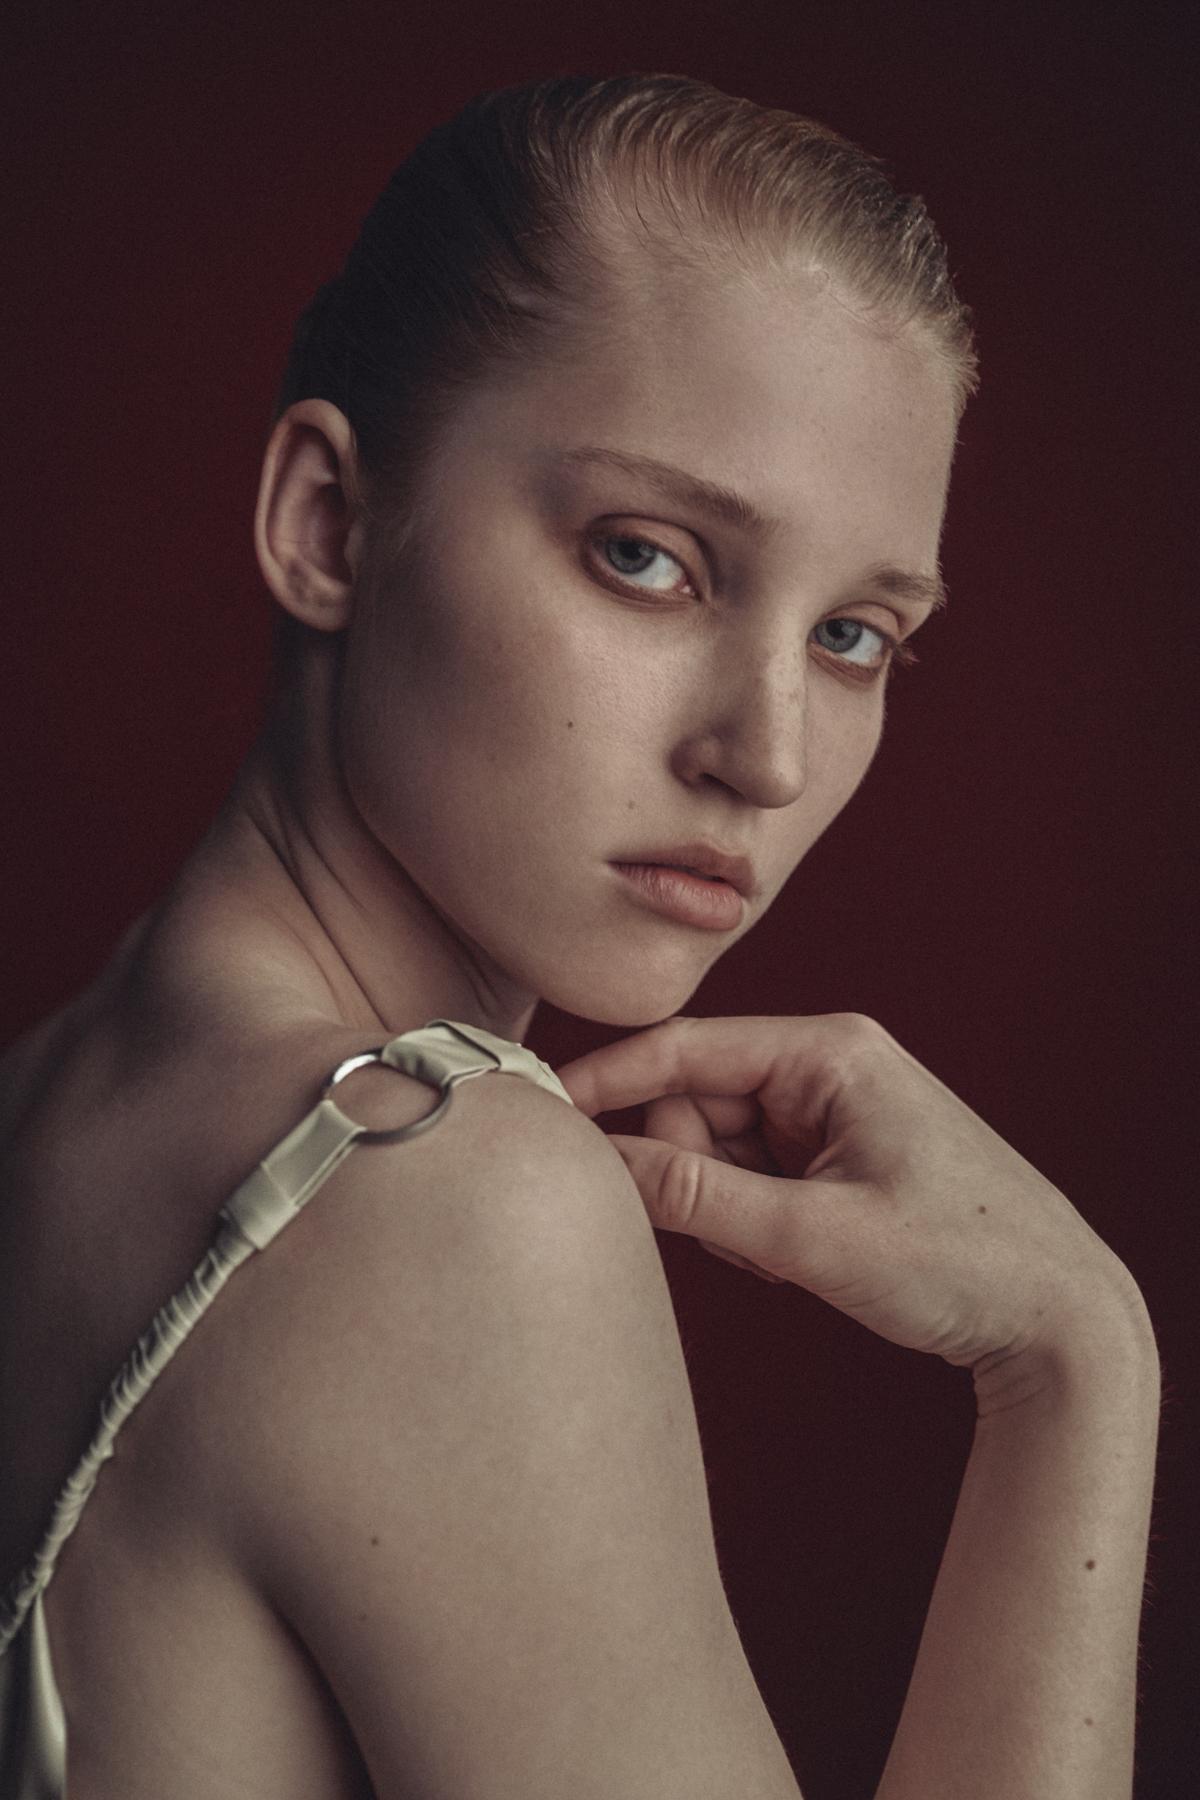 Web_Lianna_Hecht_Fotografie_Emma_Anna_kea_models_9.JPG